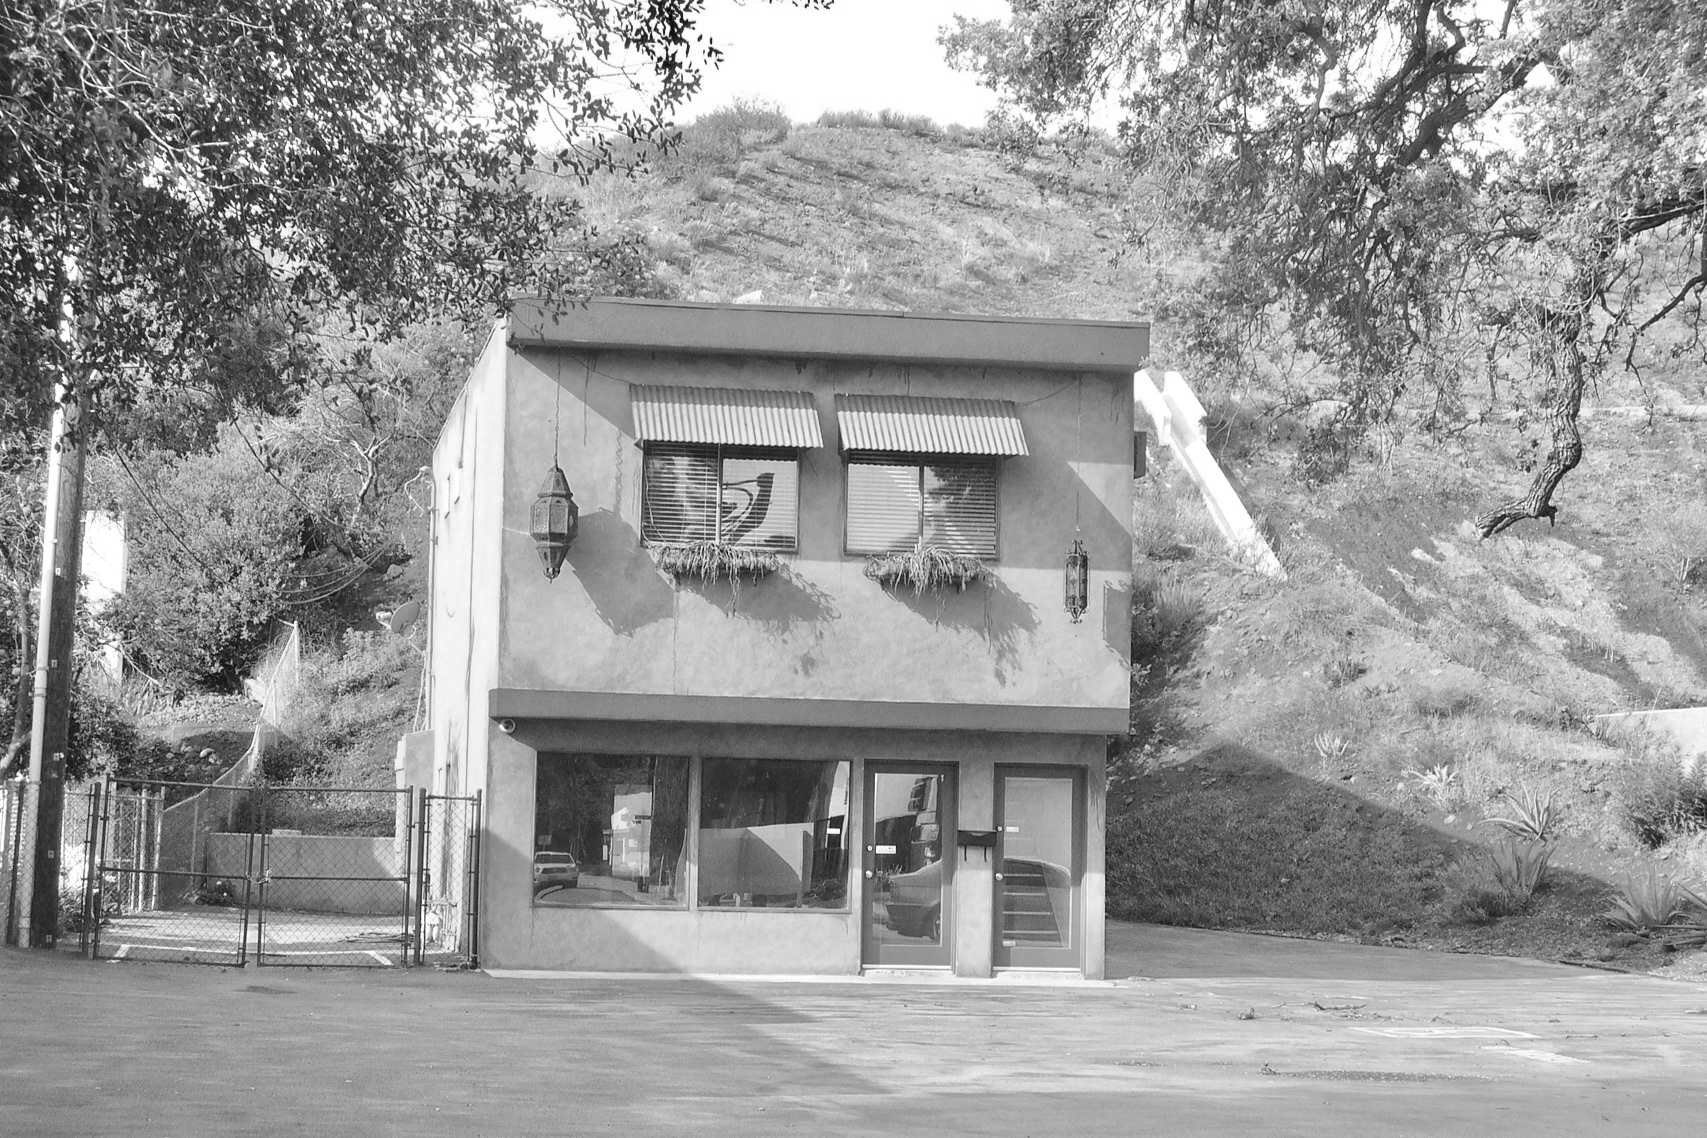 Old Oak Square - 1696 Thousand Oaks Blvd